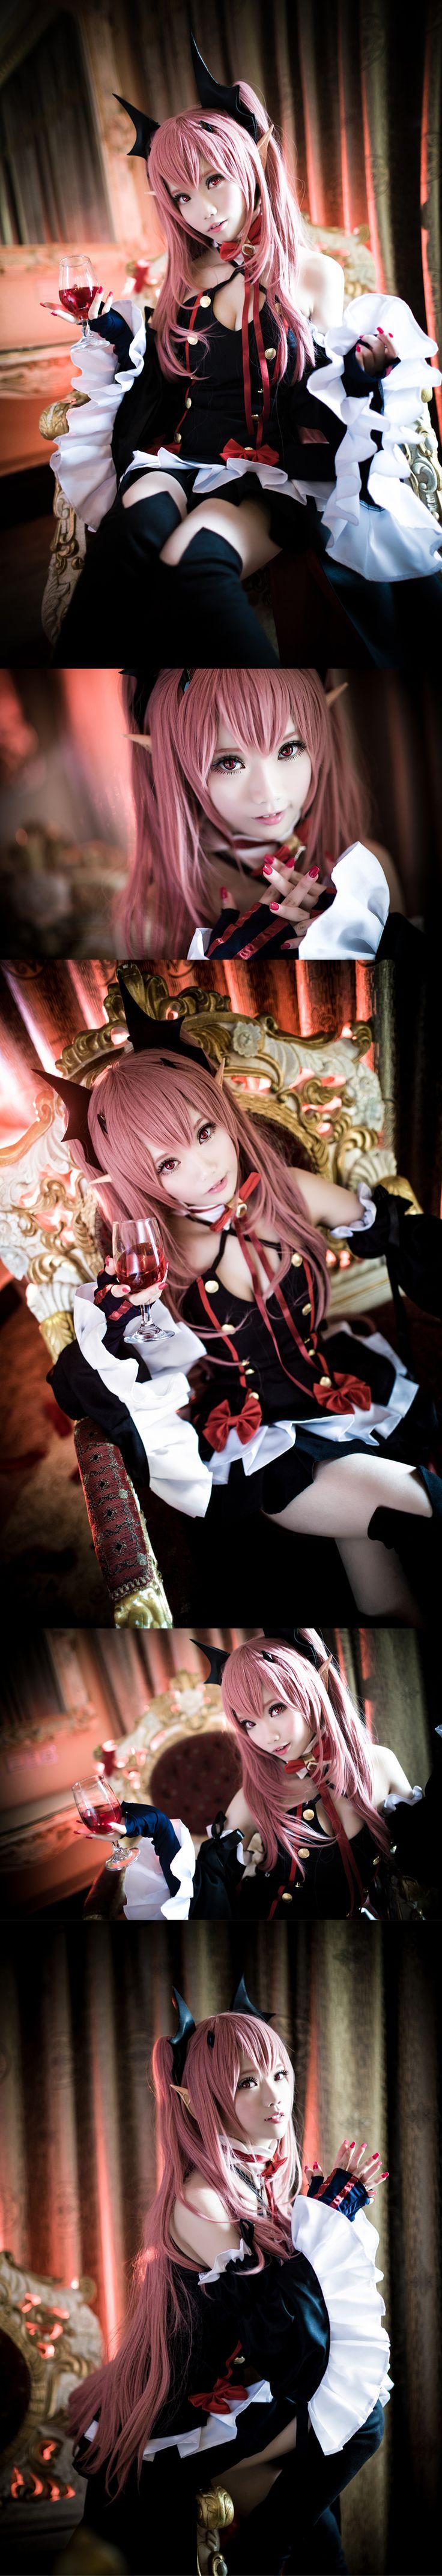 Seraph of the End,Anime Cosplay,Anime,аниме,Owari no Seraph